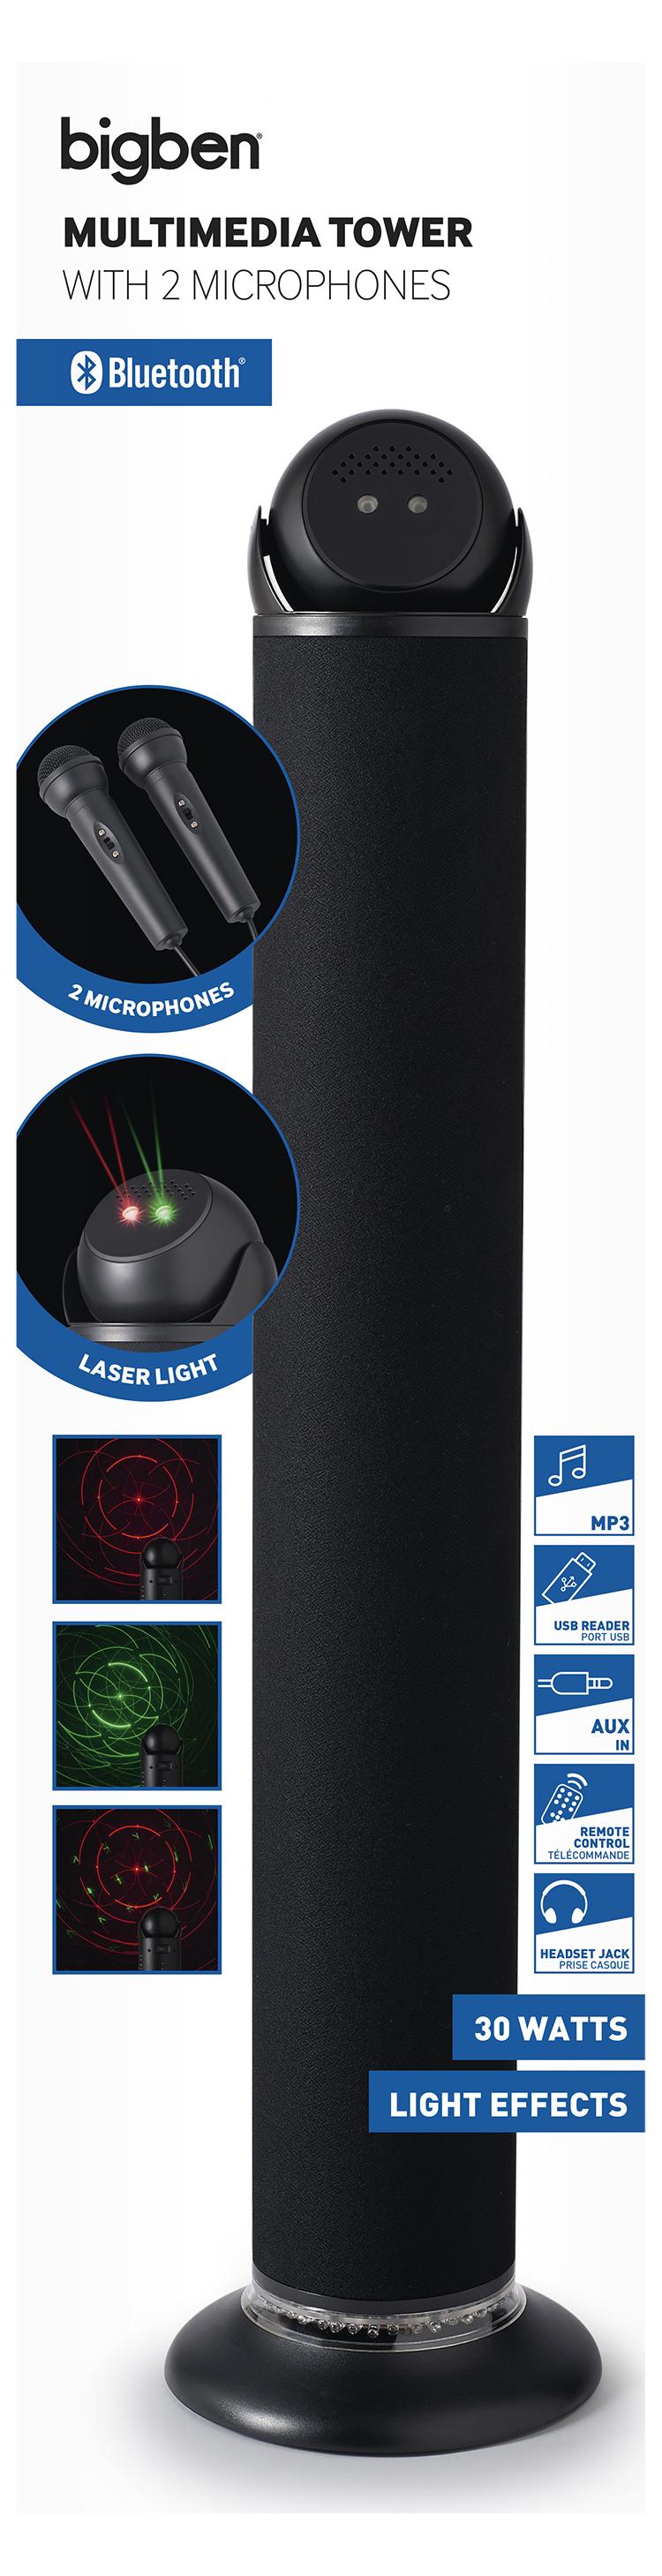 Multimedia tower with 2 microphones TW11LASER BIGBEN - Image  #2tutu#4tutu#5